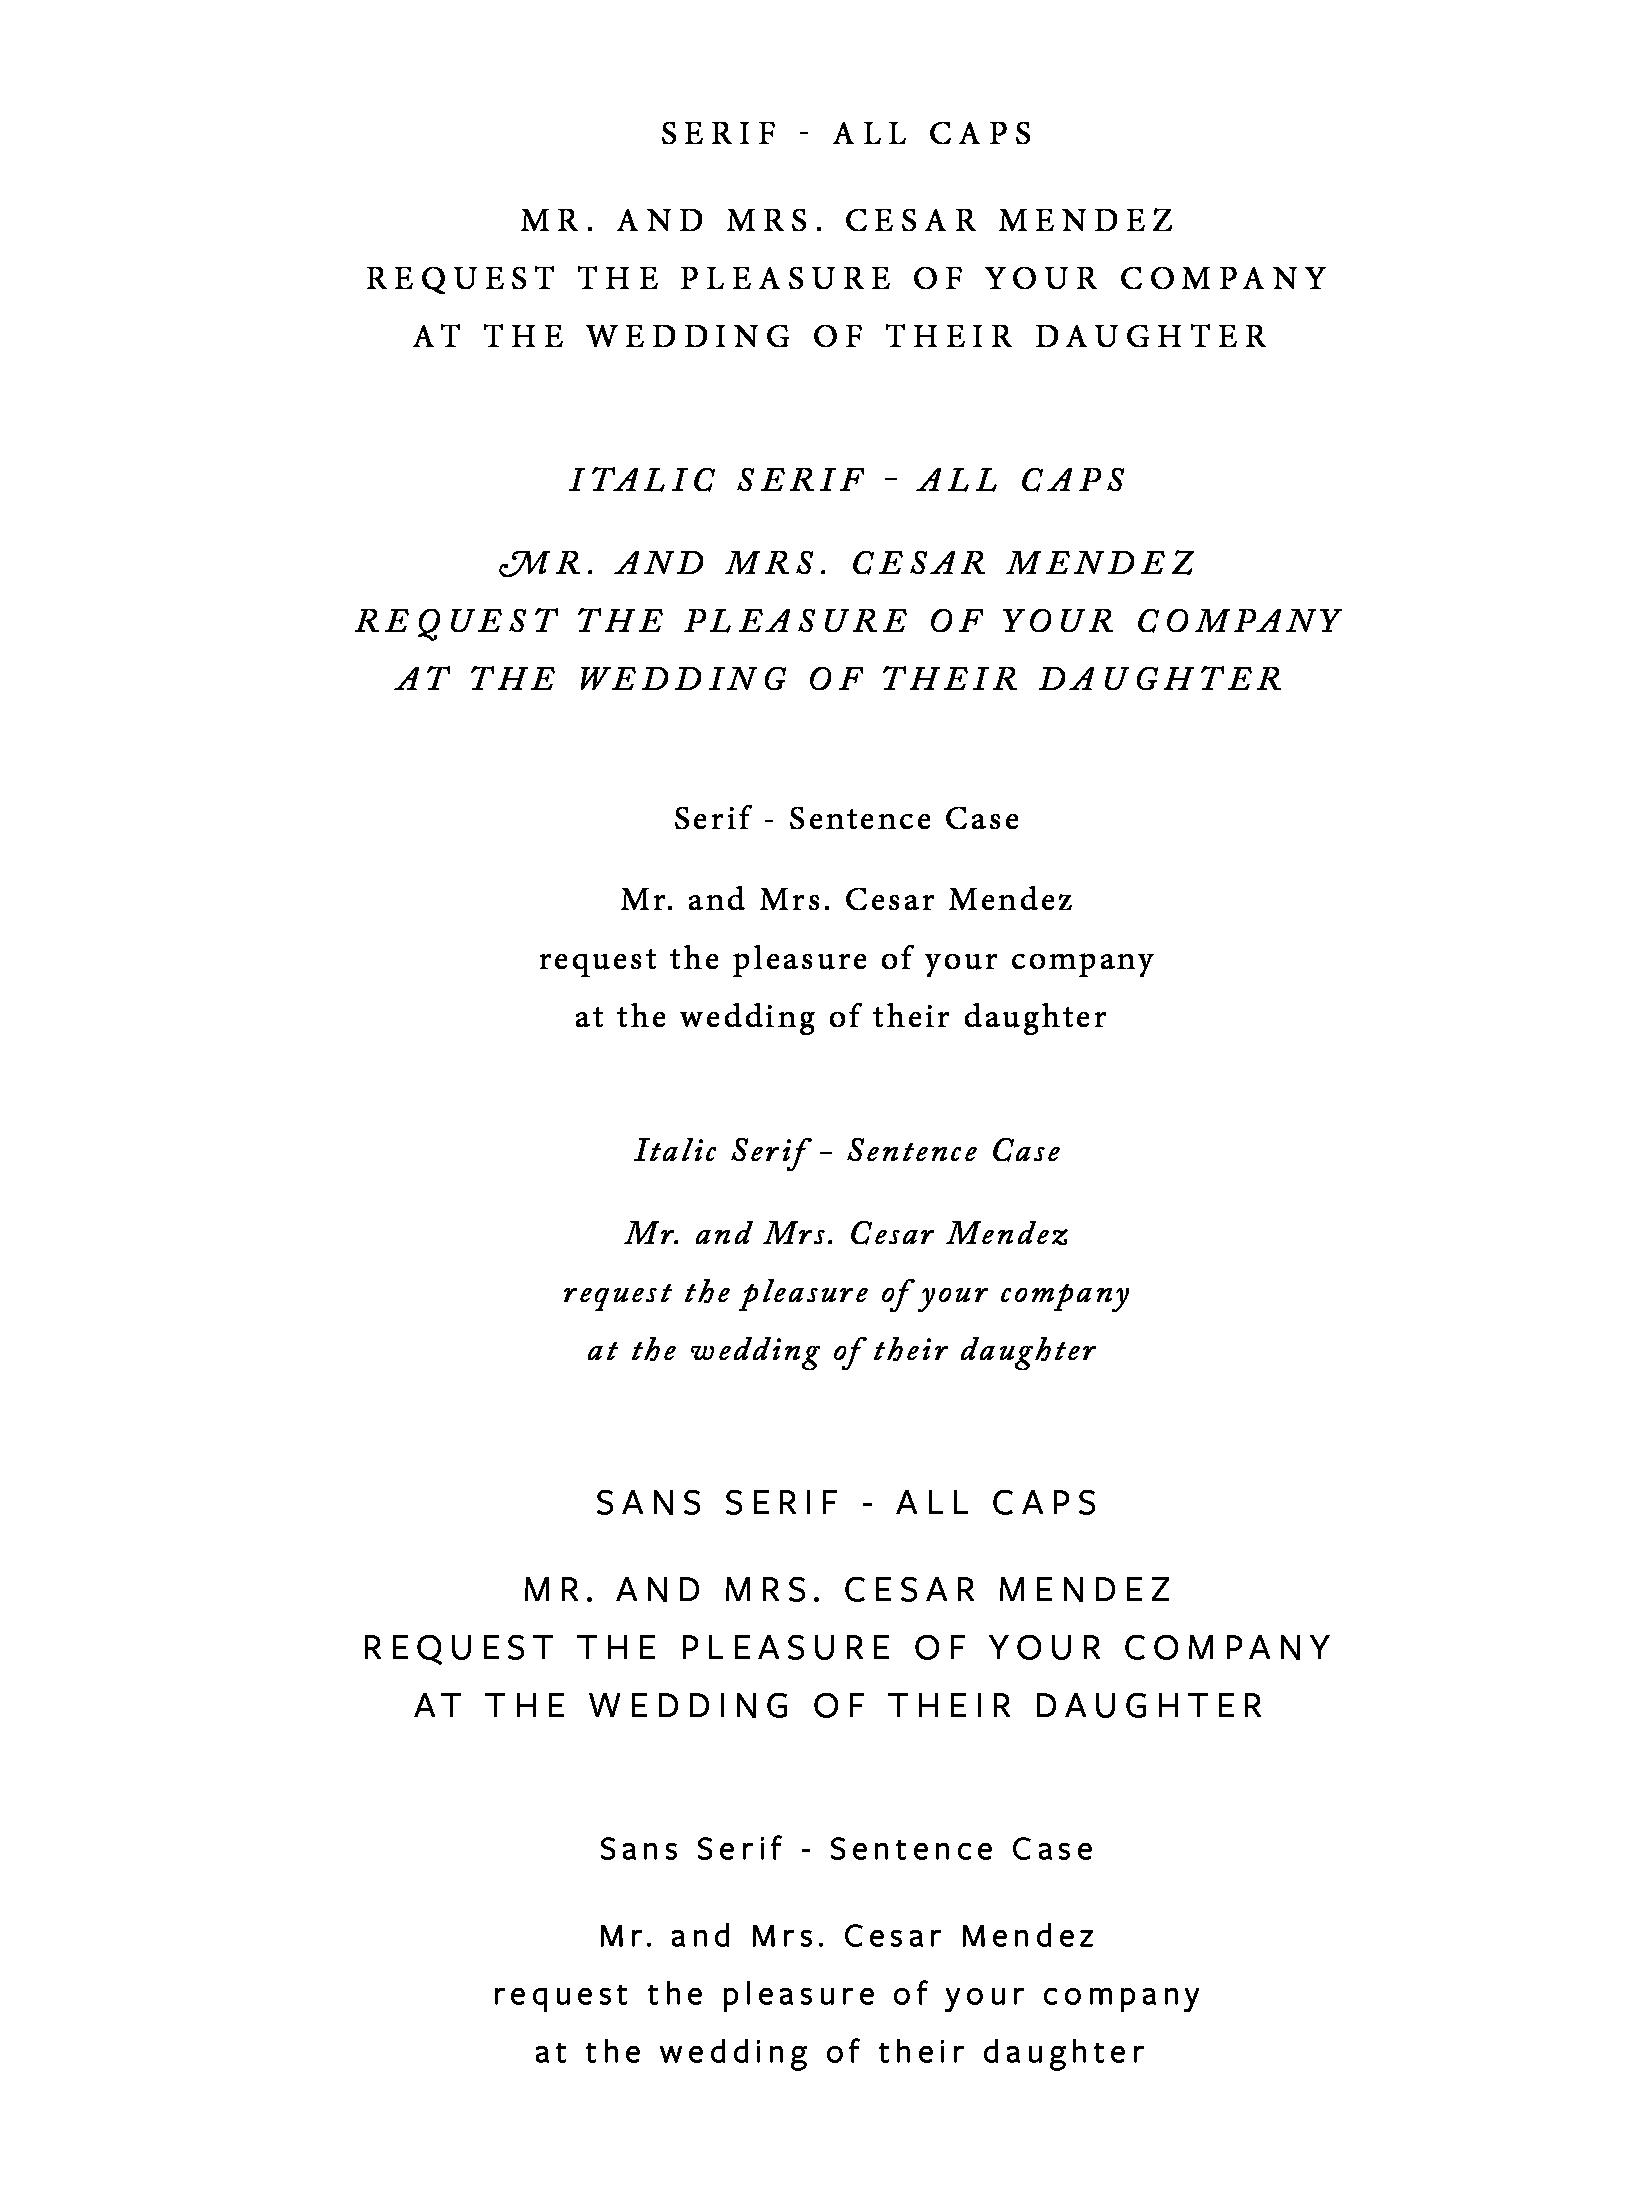 LCS Block Font Styles